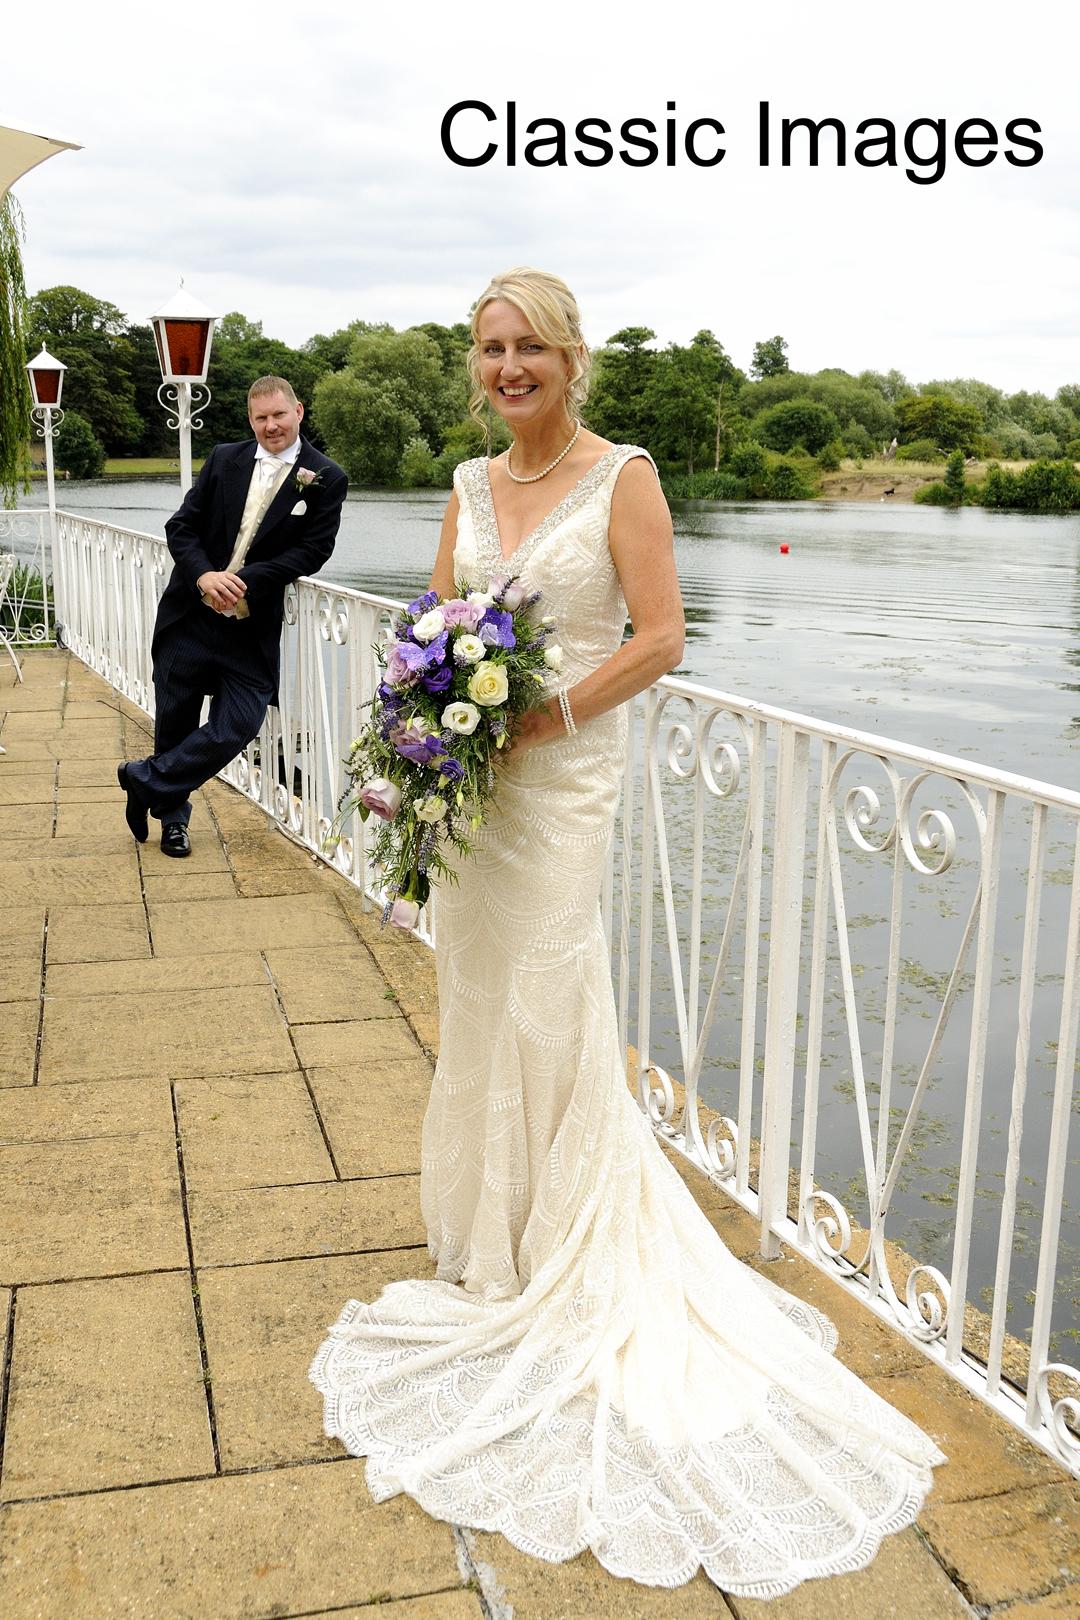 bride-and-groom-photos-wedding-warren-lodge-hotel-shepperton-surrey